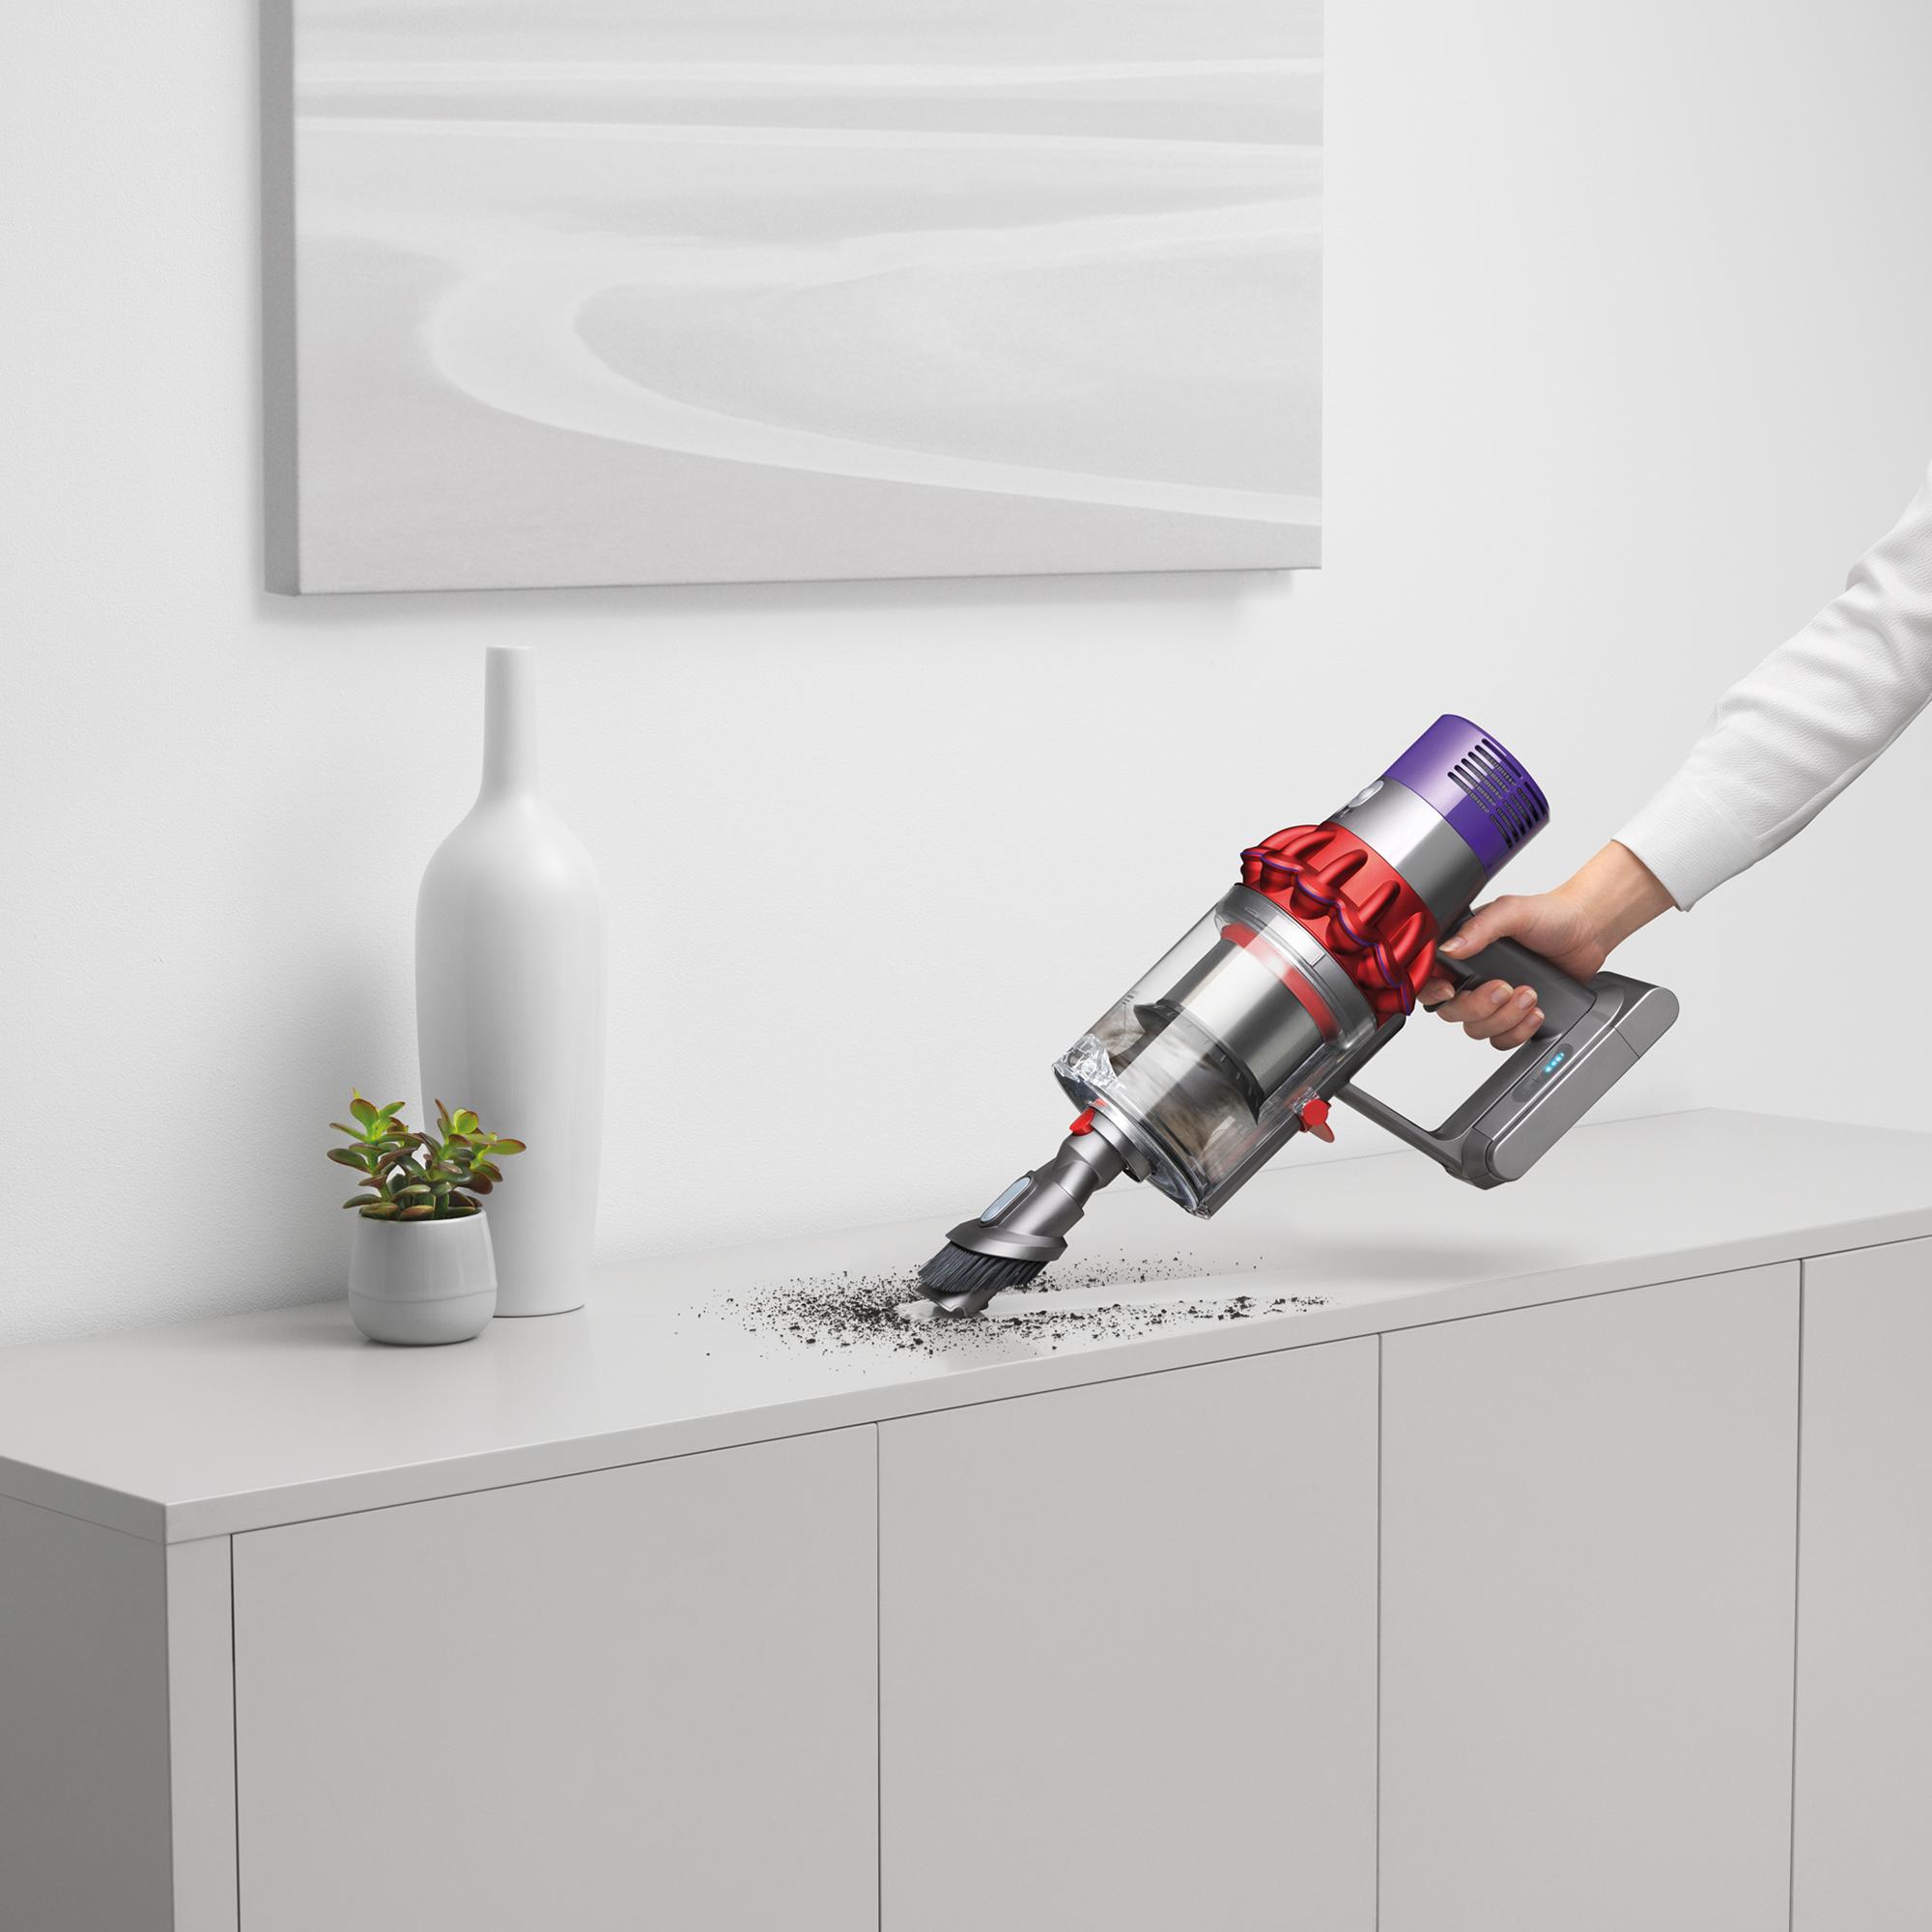 Dyson-V10-Animal-Pro-Cordless-Vacuum-Cleaner-Refurbished thumbnail 27